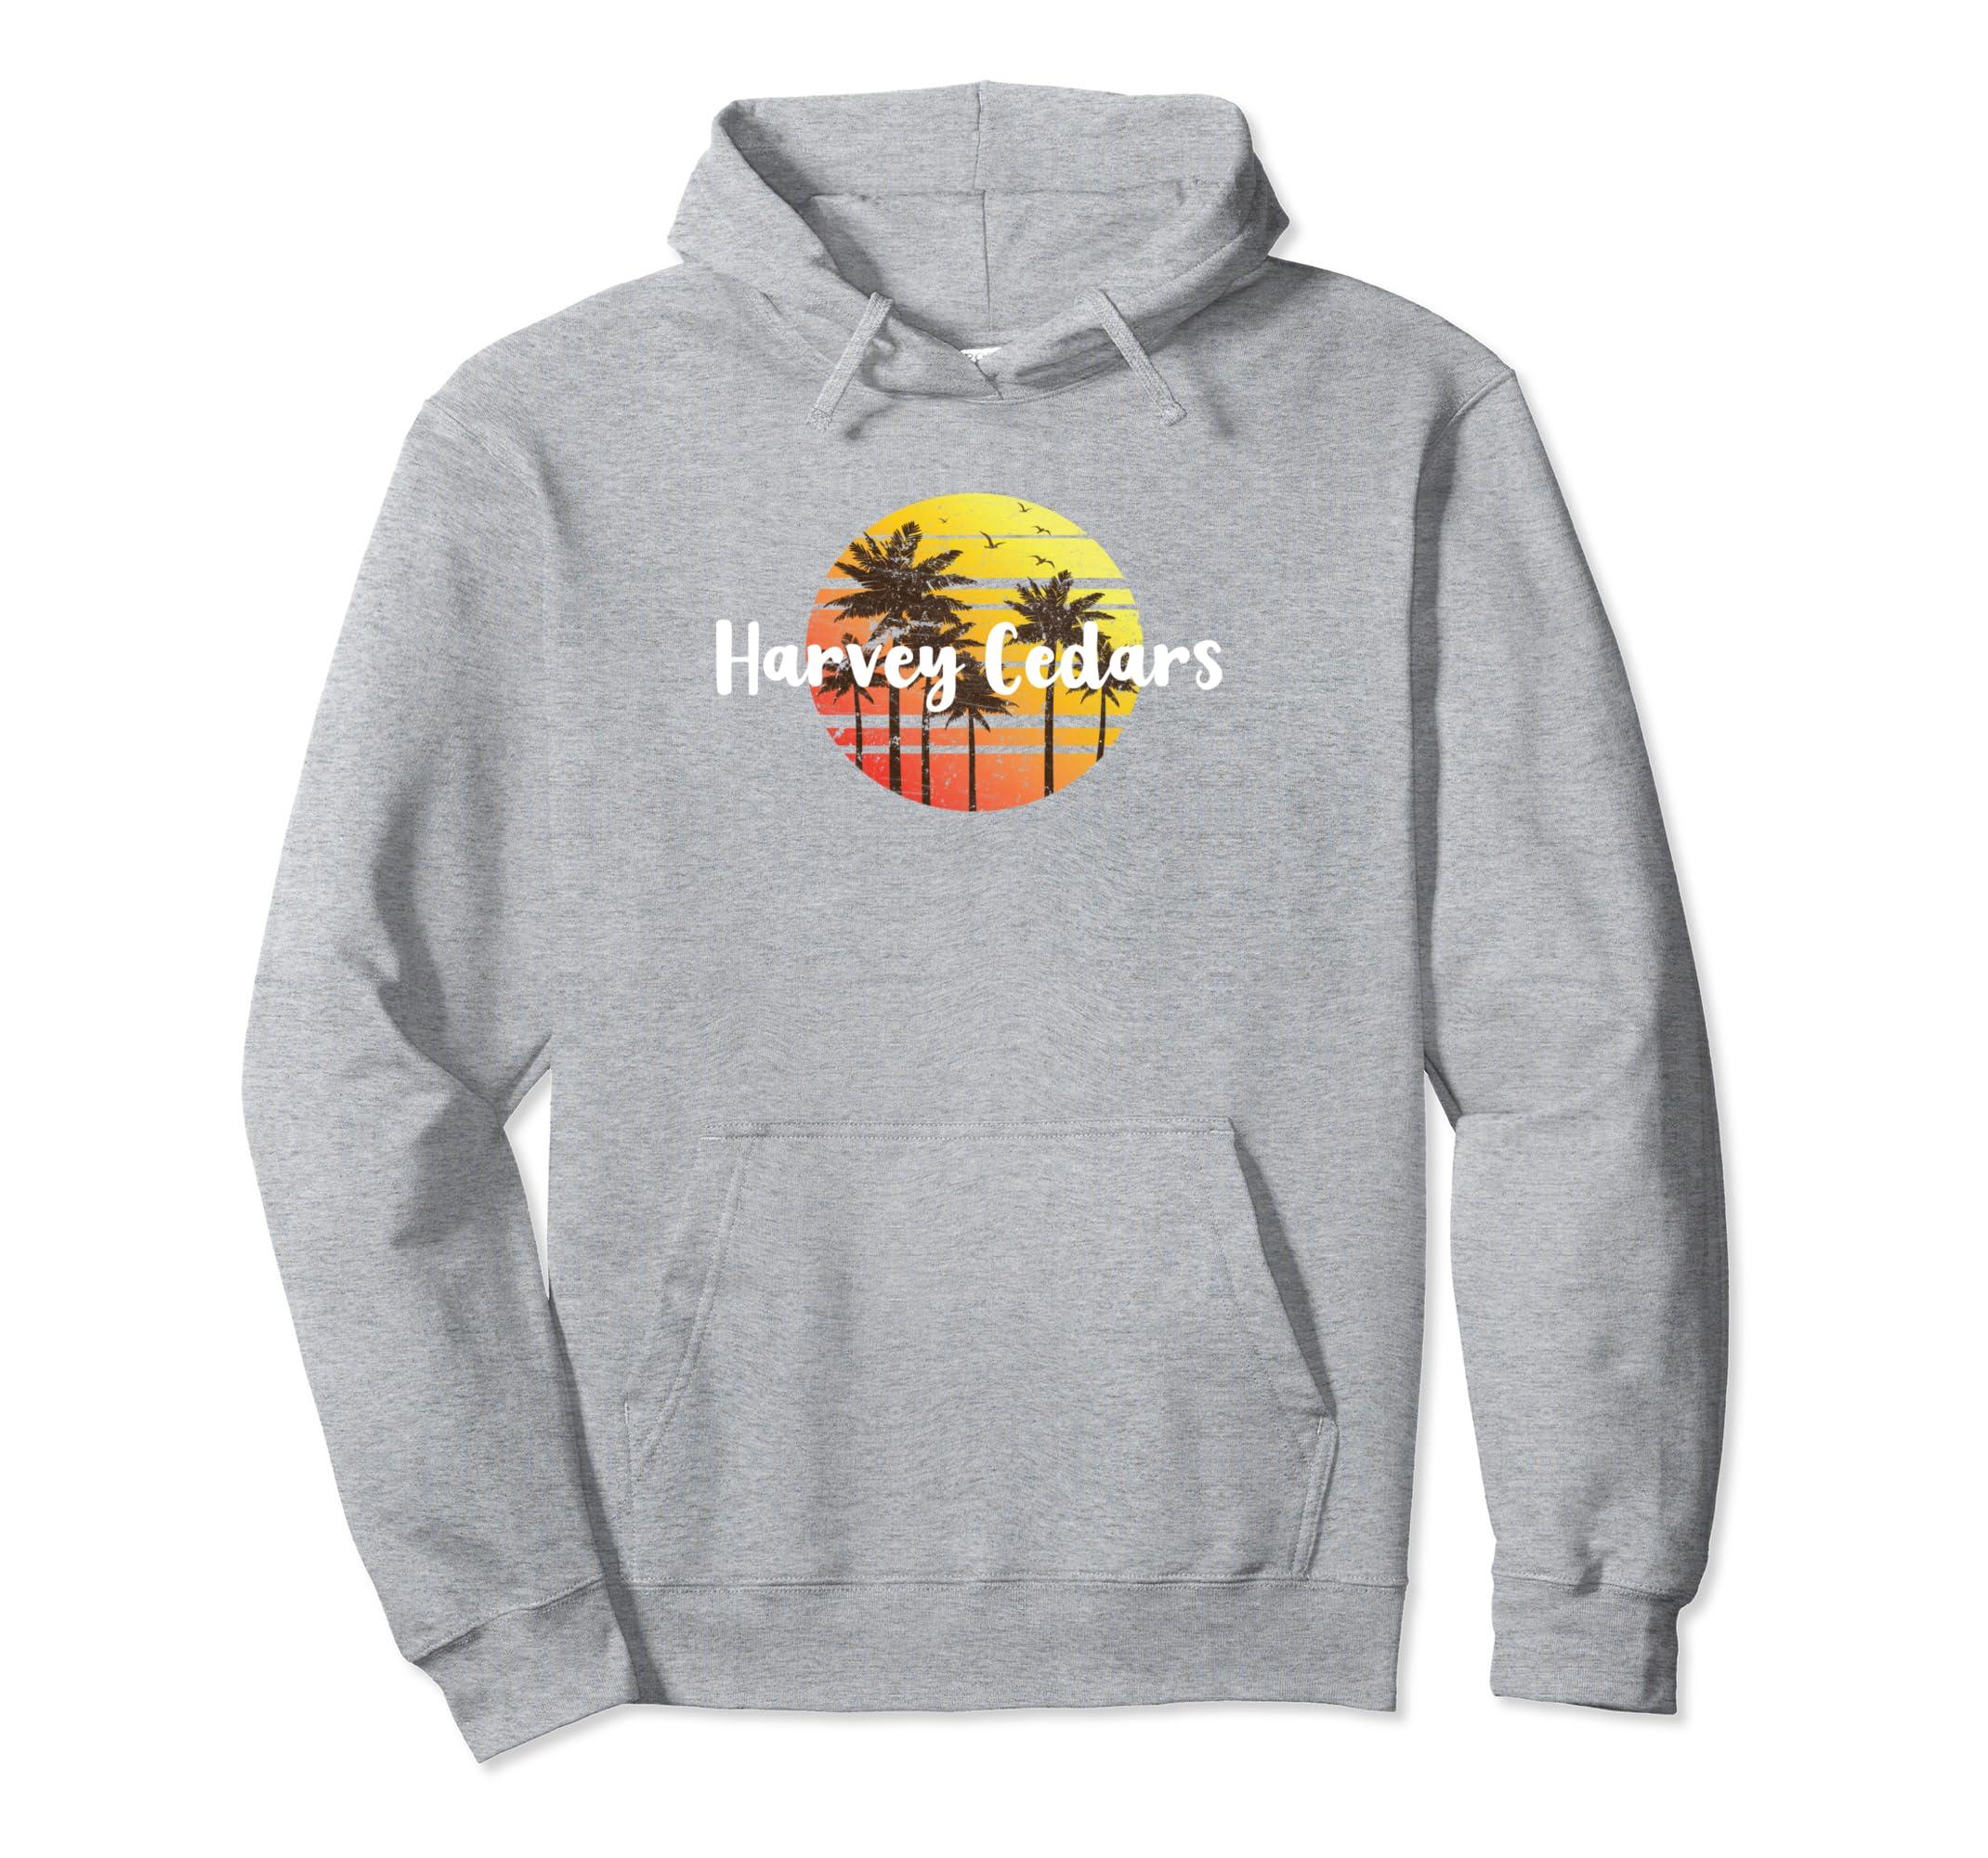 Vintage Harvey Cedars Sunset Gift Souvenir Hoodie-azvn